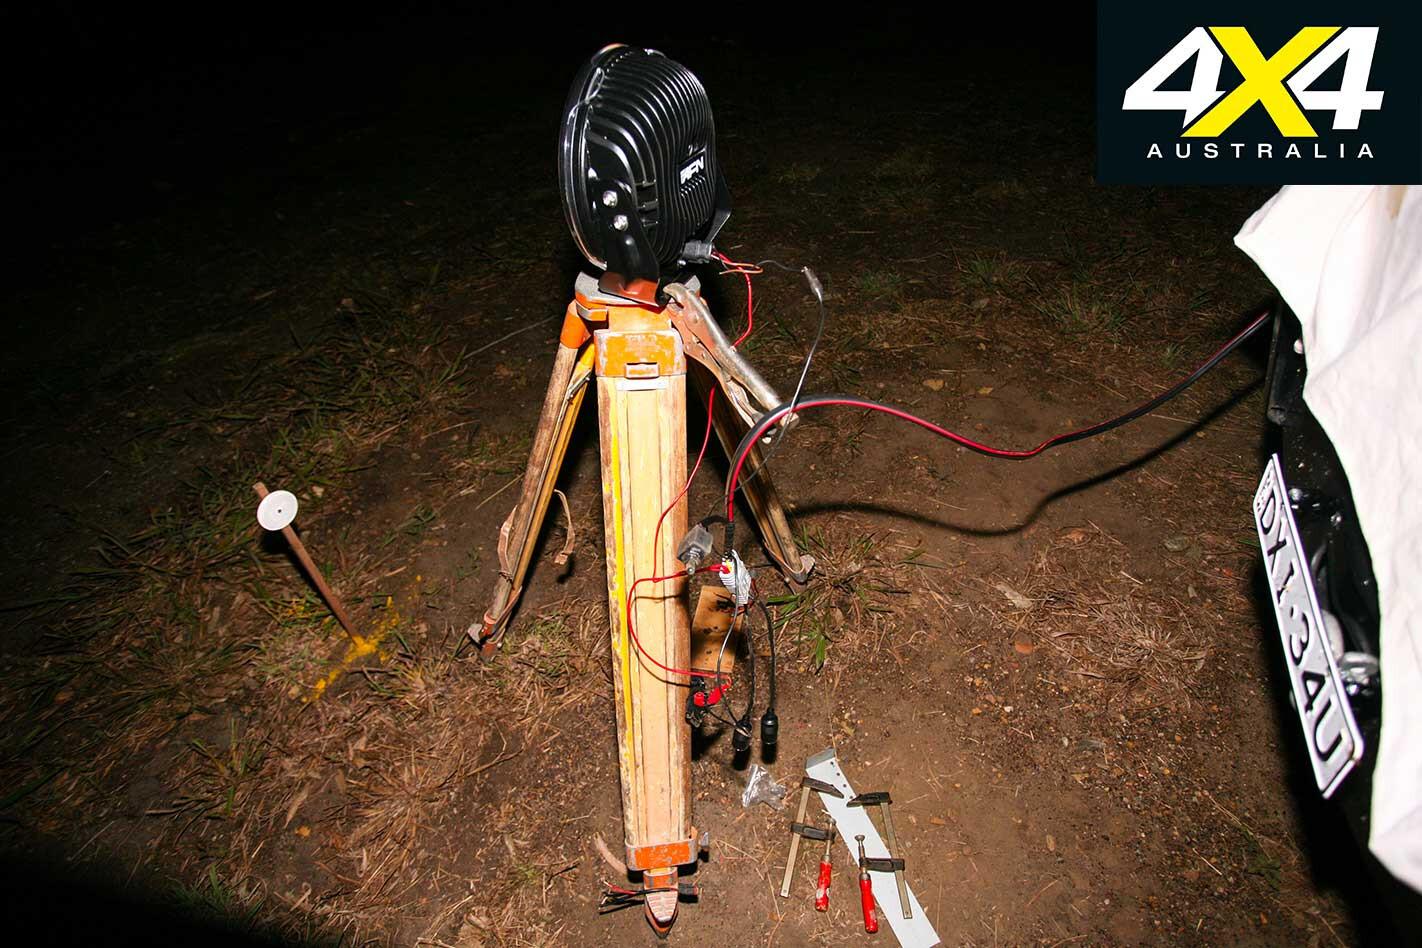 4 X 4 LED Driving Light Testing Rig Setup Jpg